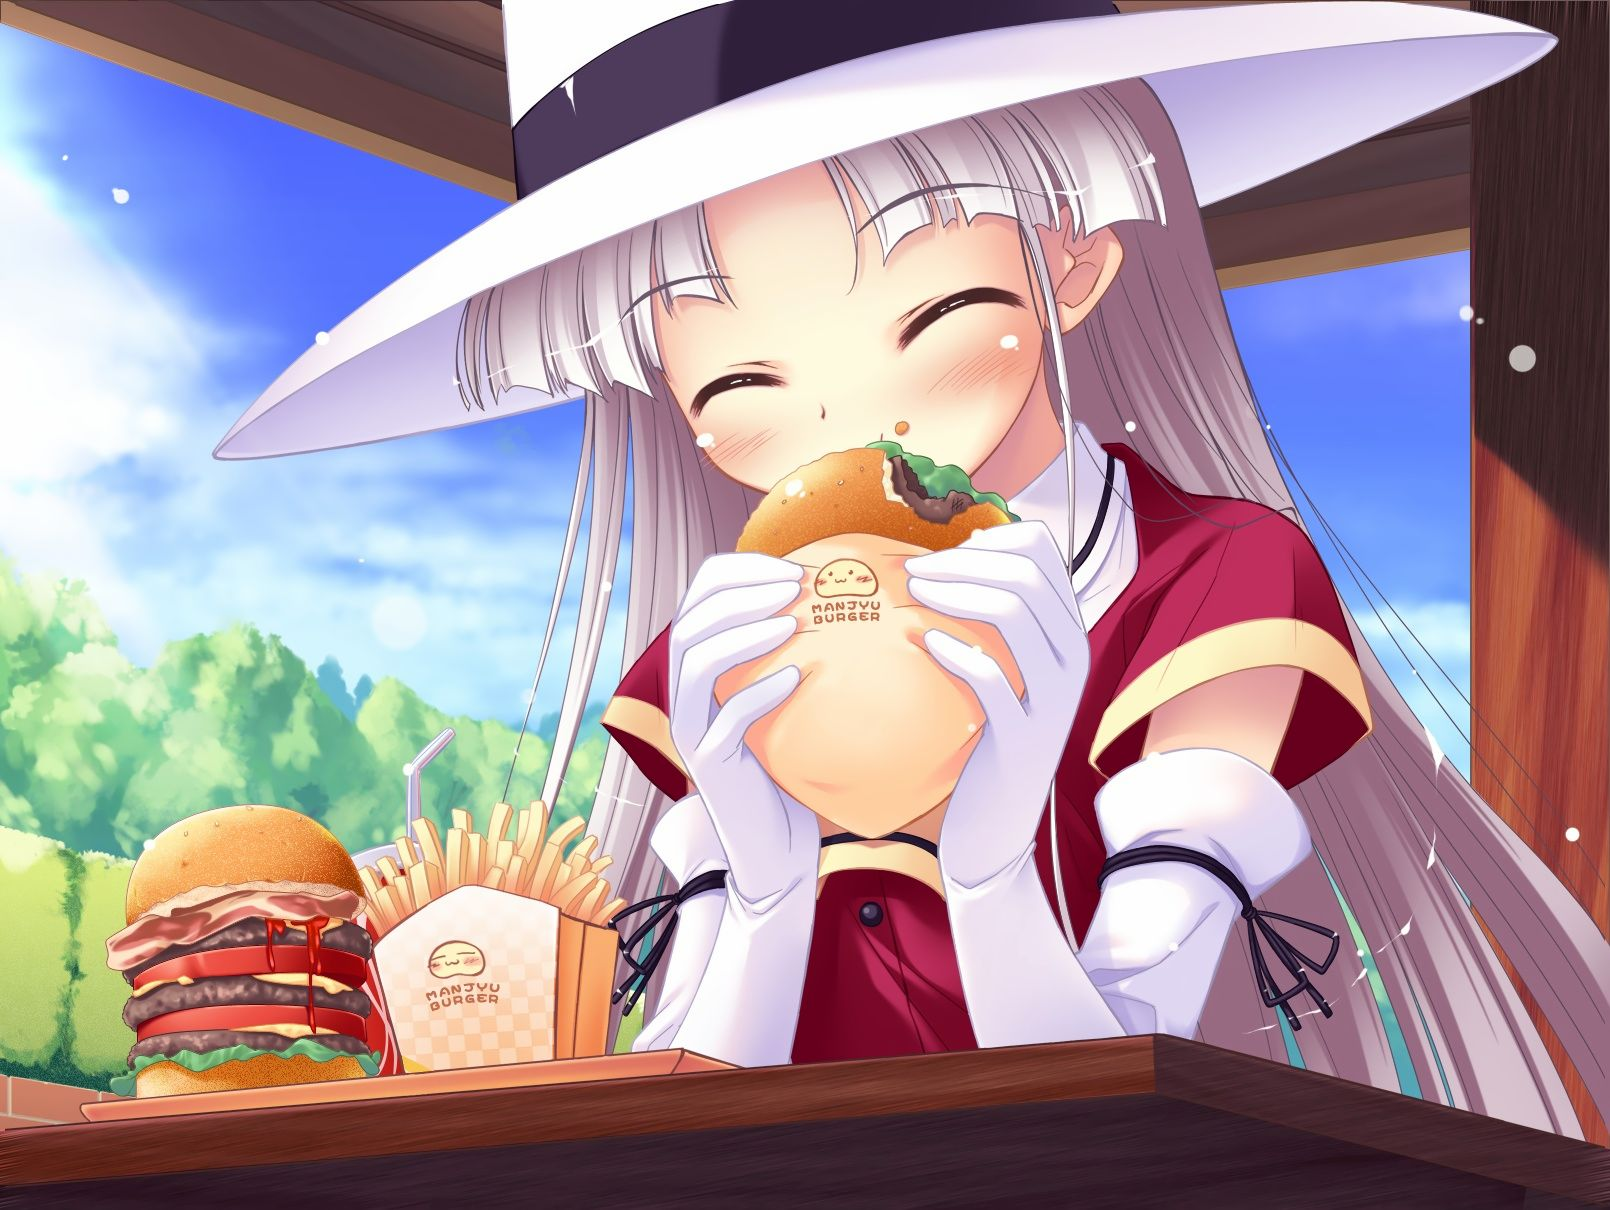 elbow_gloves food gloves gray_hair happiness hat long_hair shikimori_ibuki sky